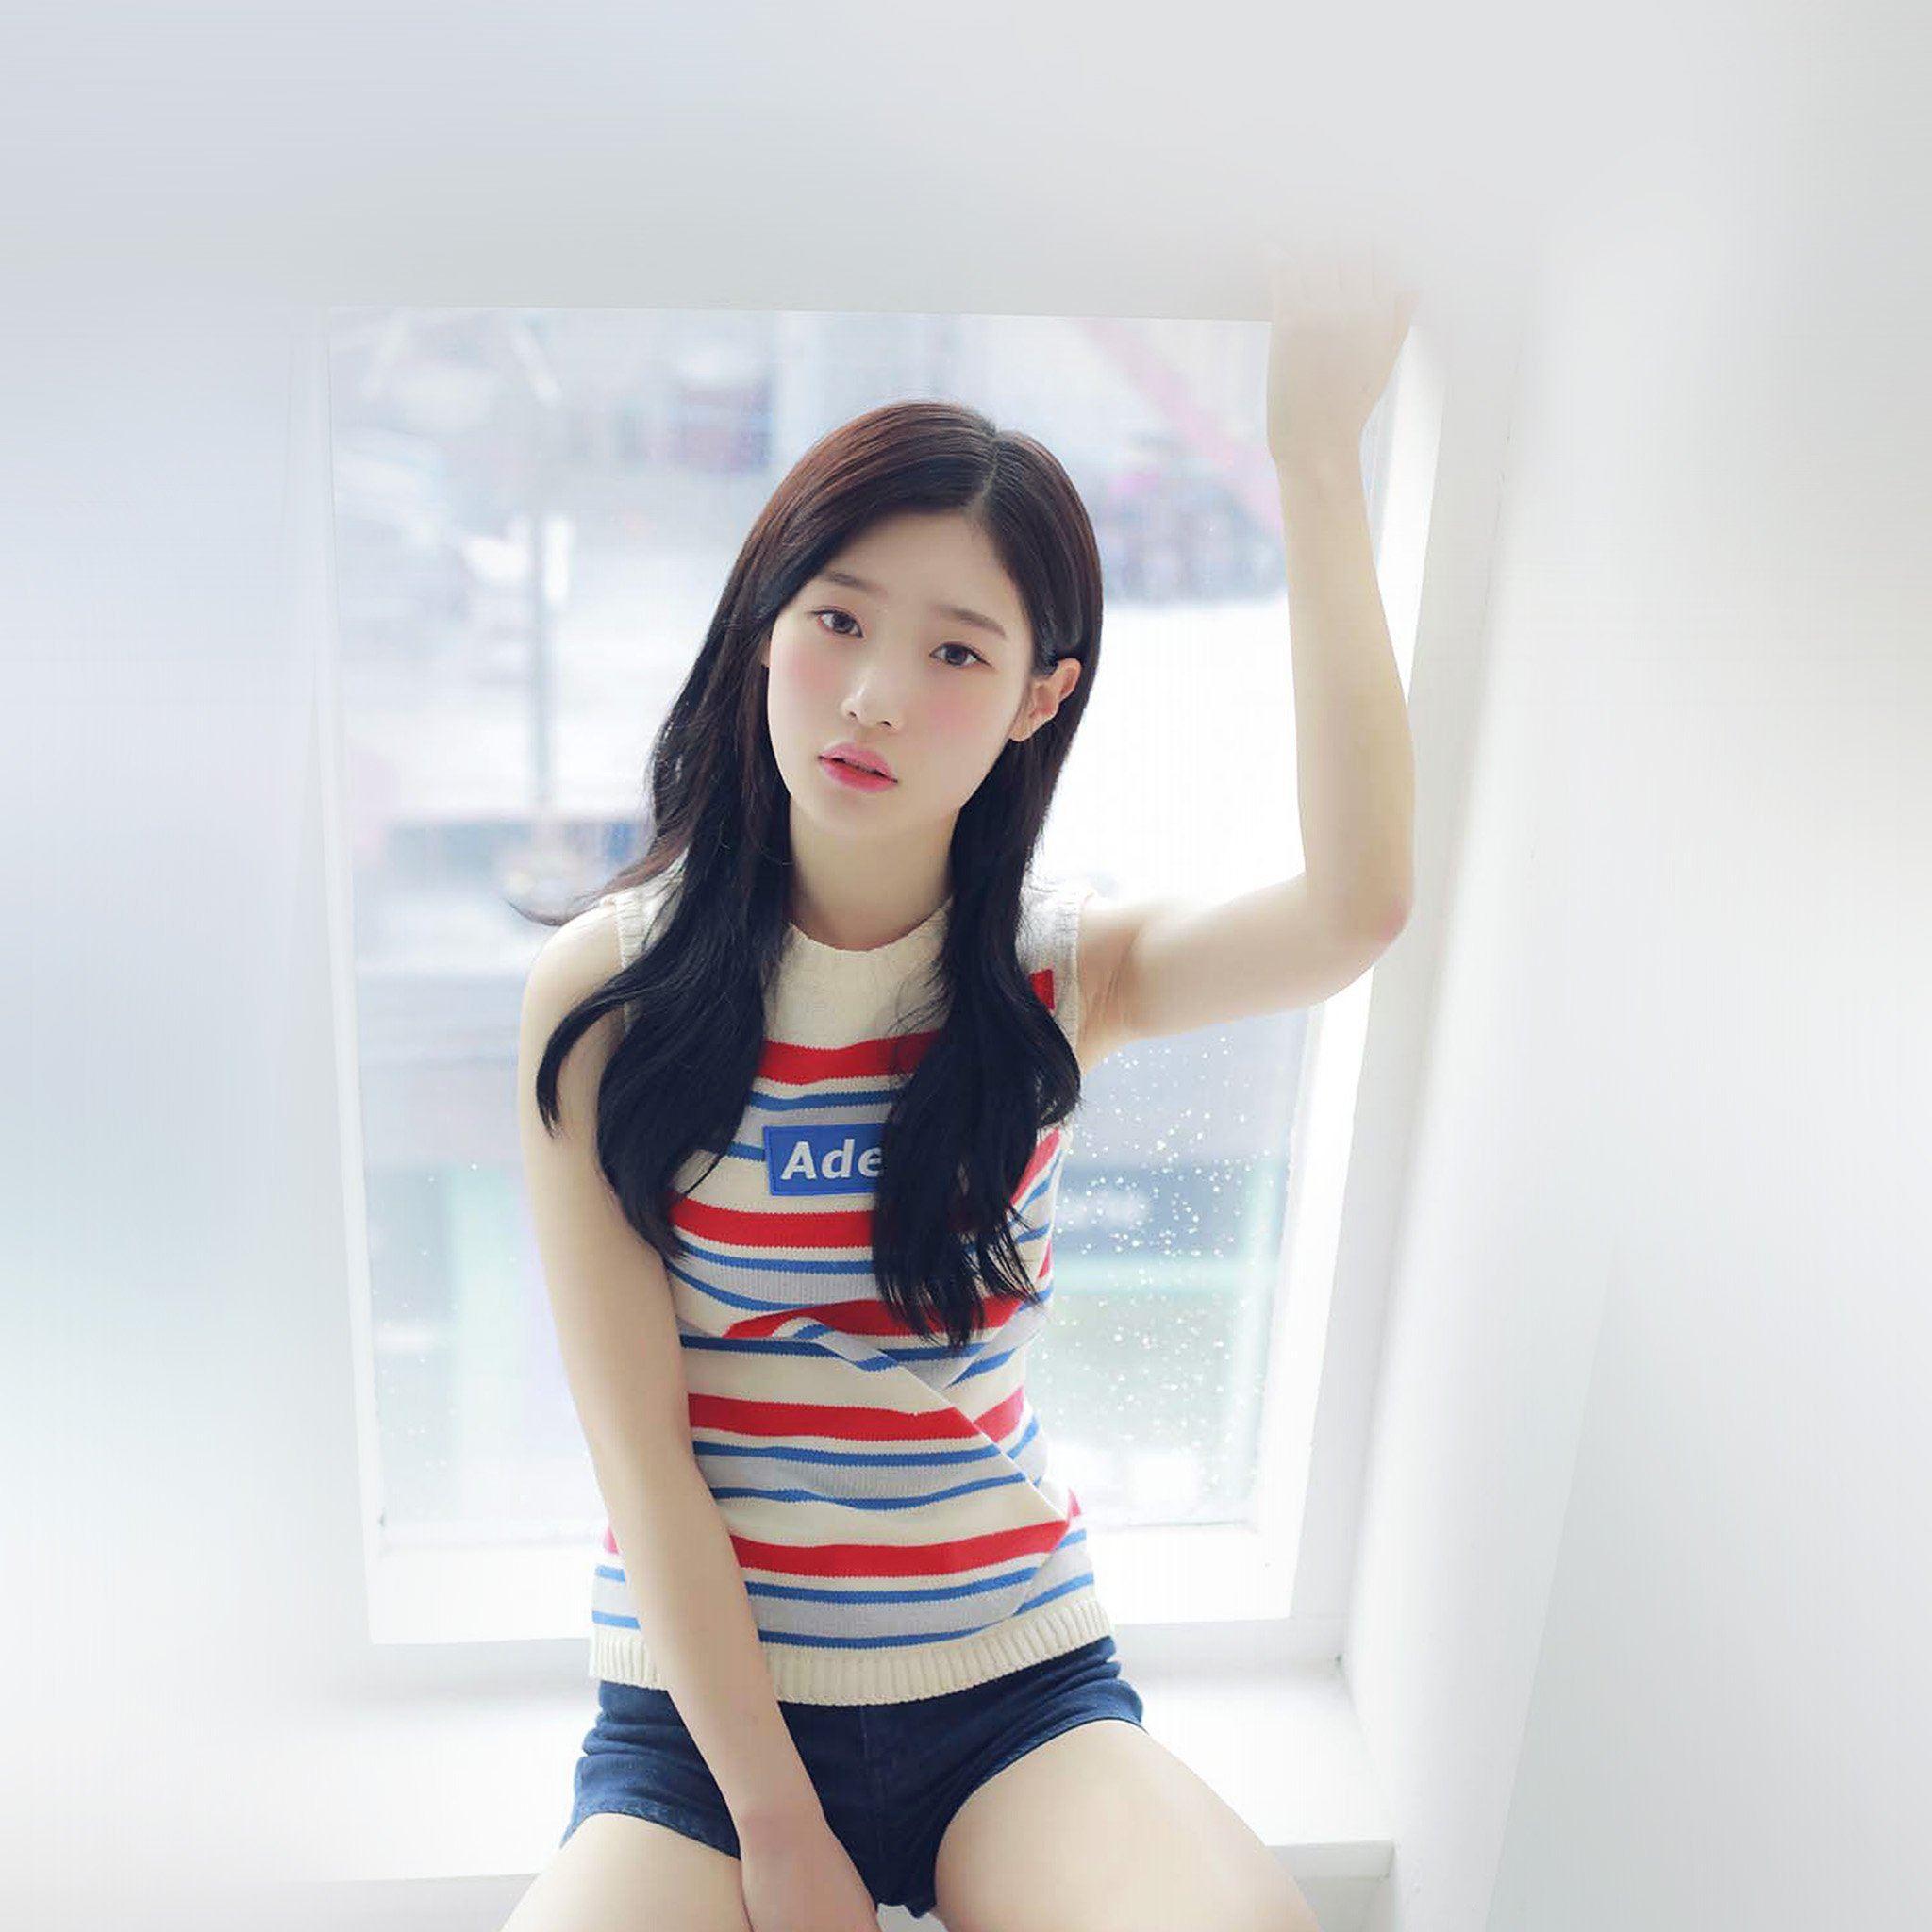 Chaeyeon Ioi Kpop Girl White Cute Ipad Air Wallpapers Free